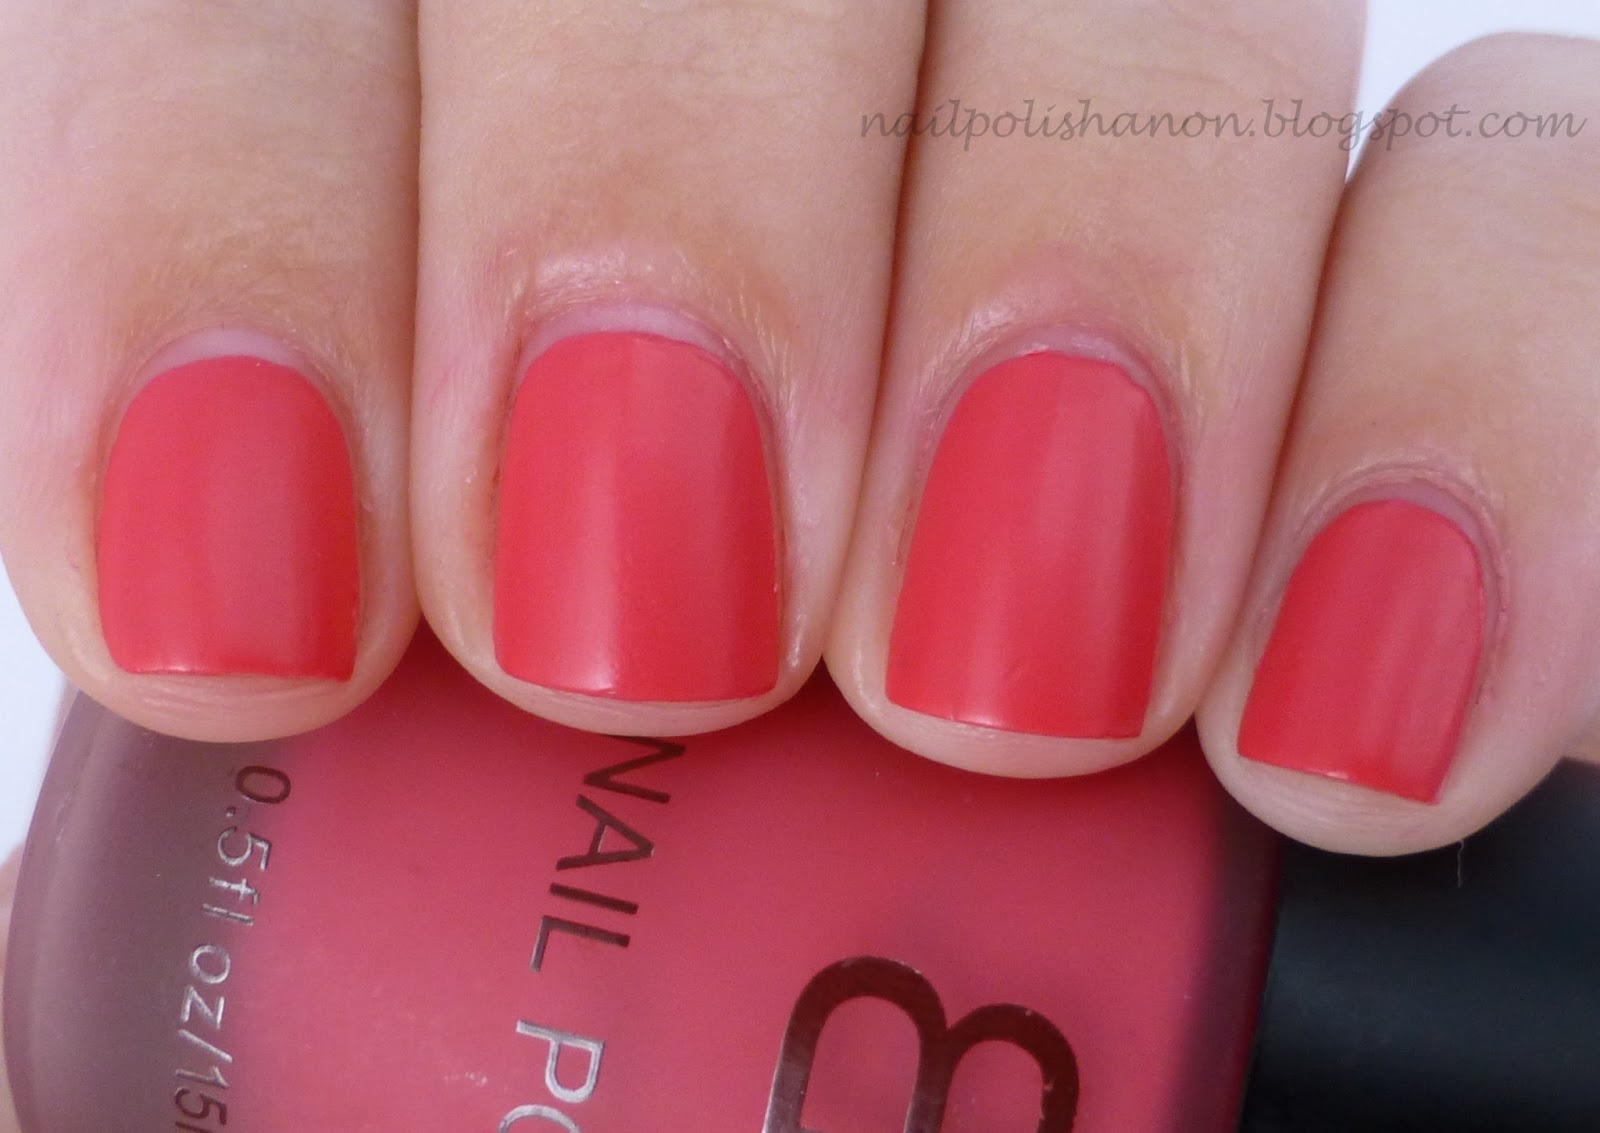 Nail Polish Anon: BK Matte Pink Polish from Born Pretty Store